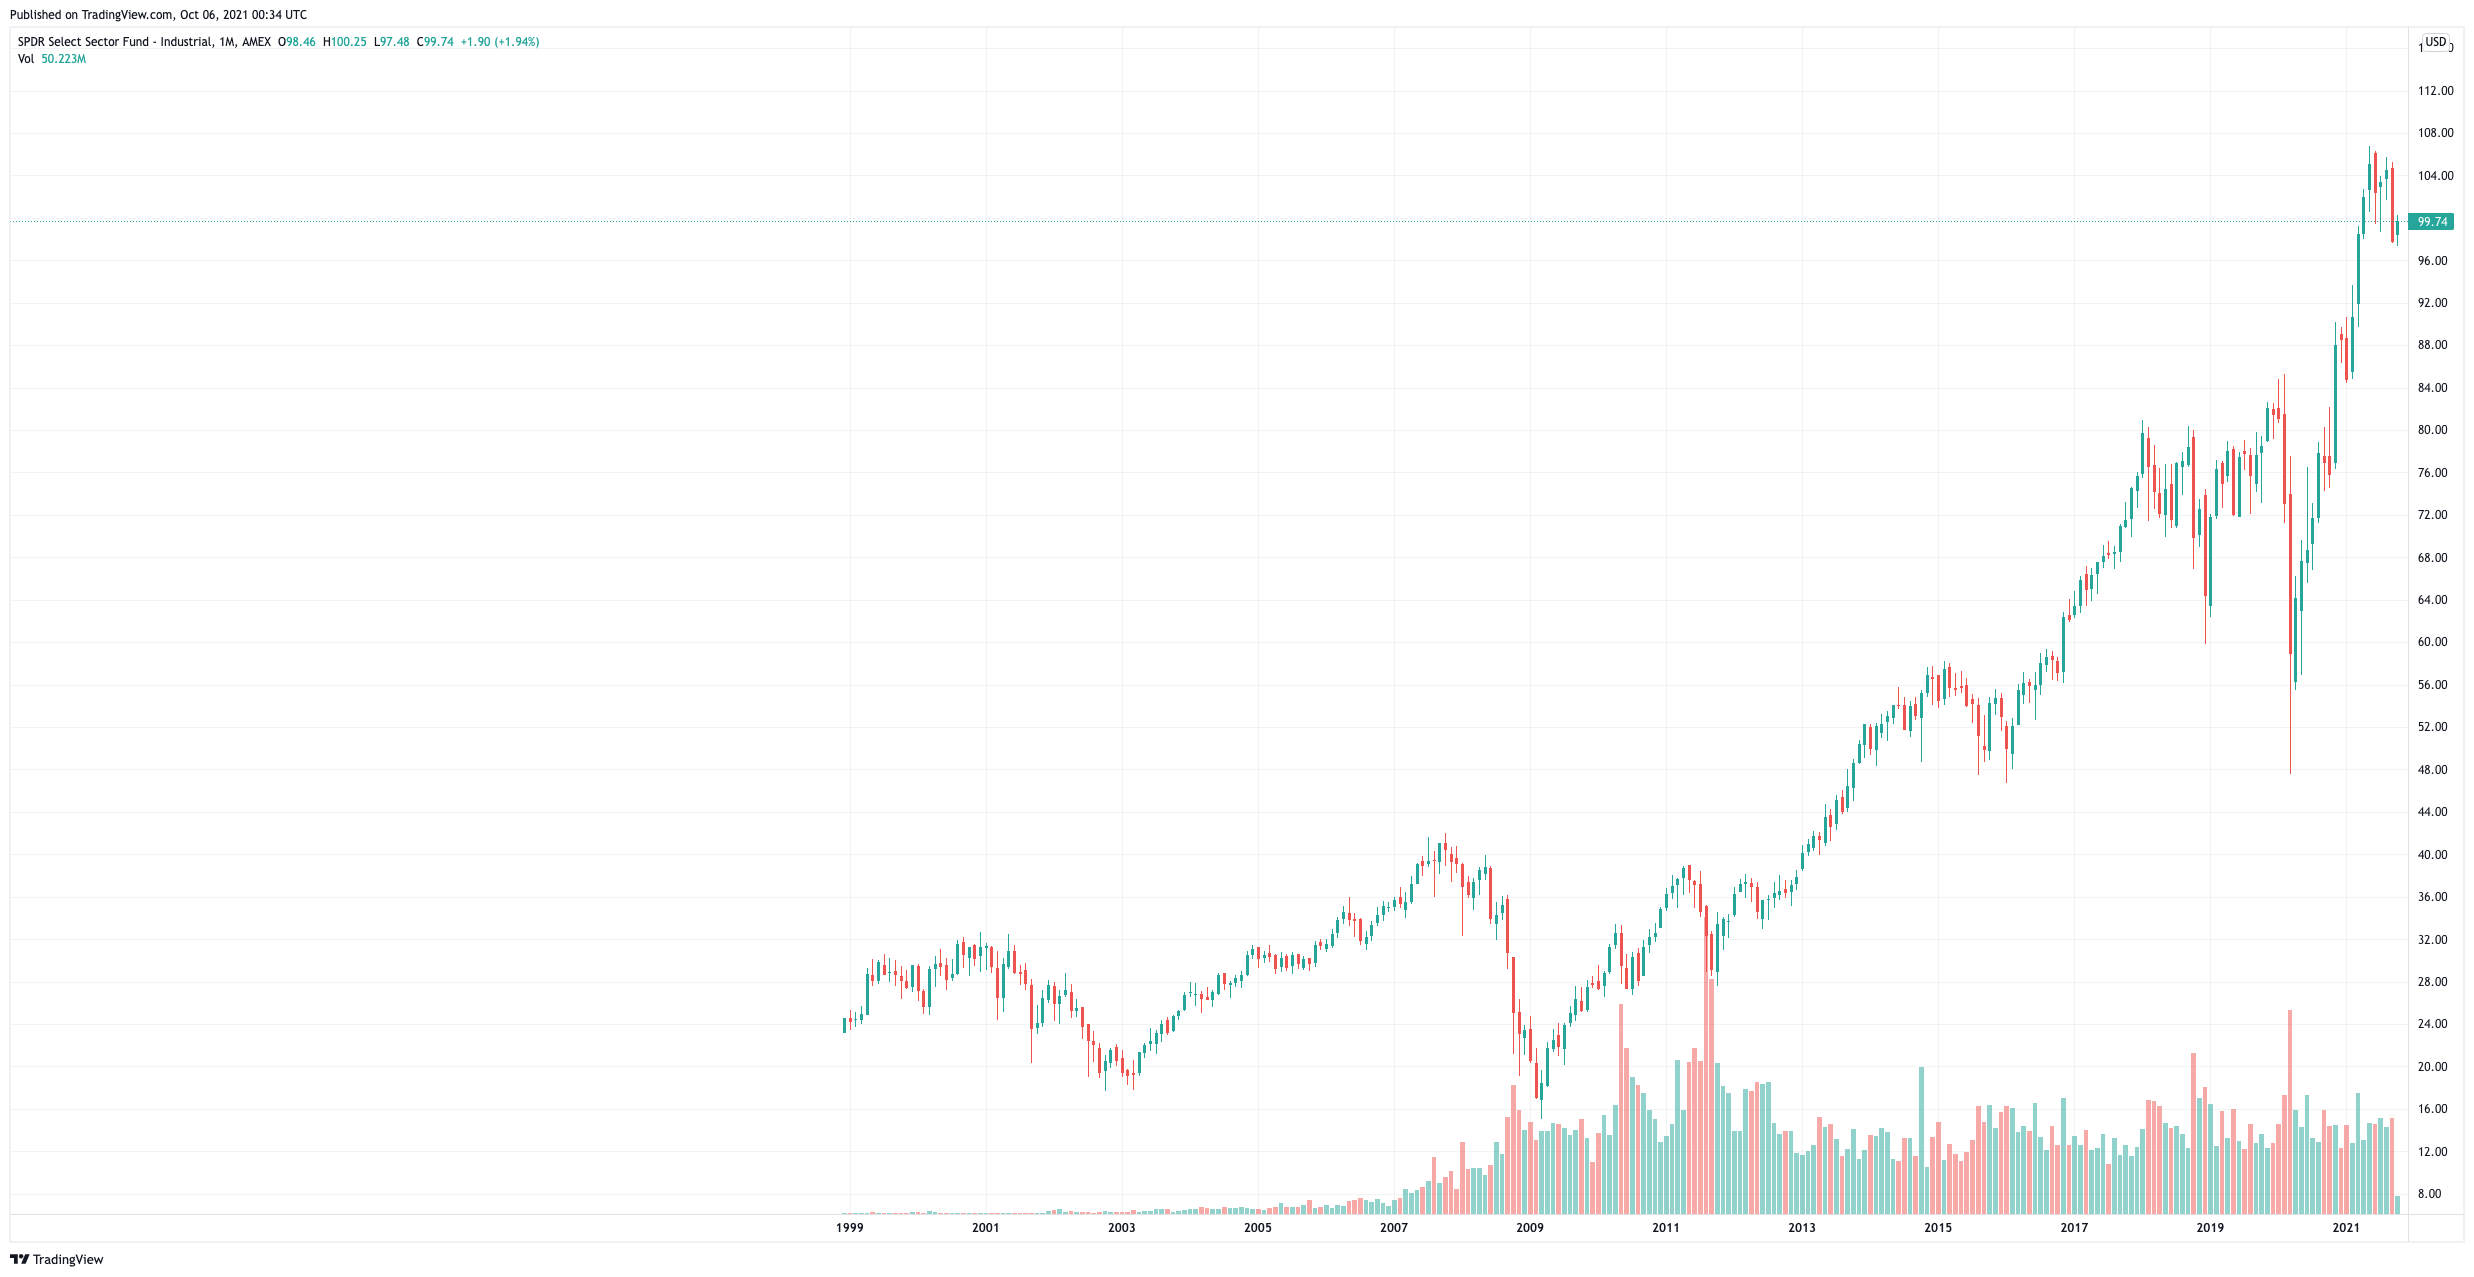 XLI ETF Price Chart